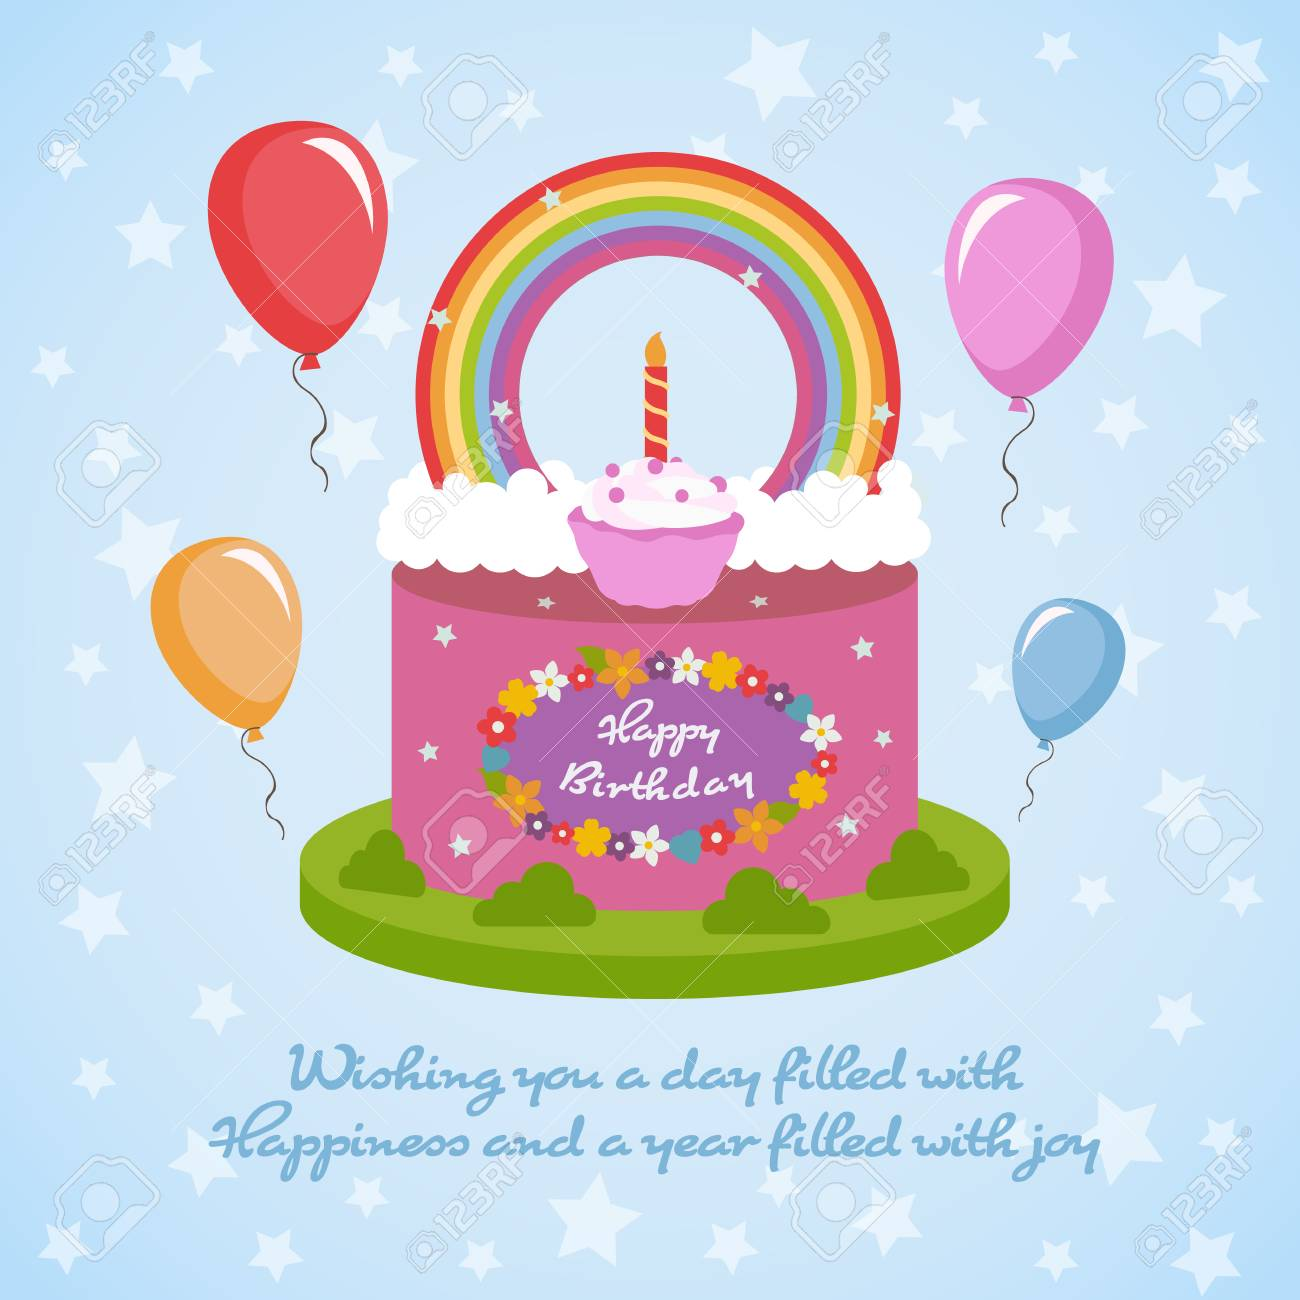 Happy Birthday Card Design Template Royalty Free Cliparts Vectors